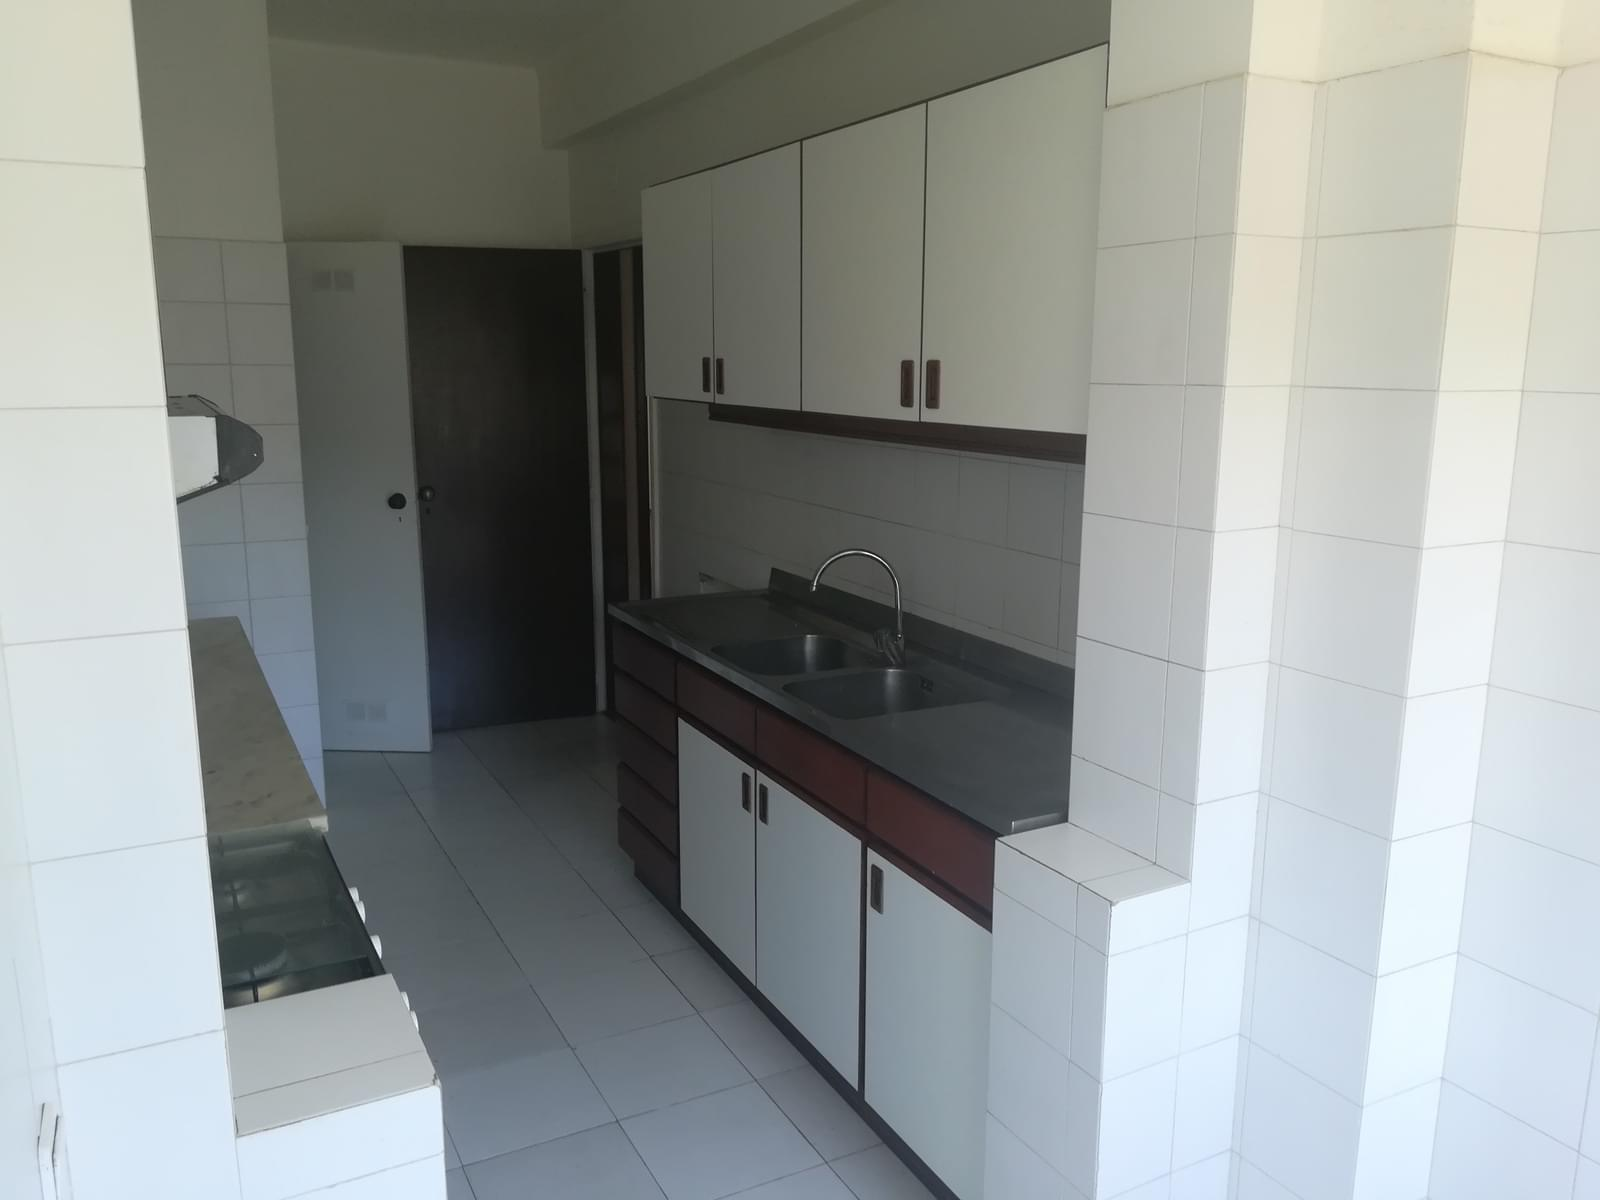 pf17568-apartamento-t3-oeiras-6e3a2043-c404-4921-9d6a-9f6bc5609a08